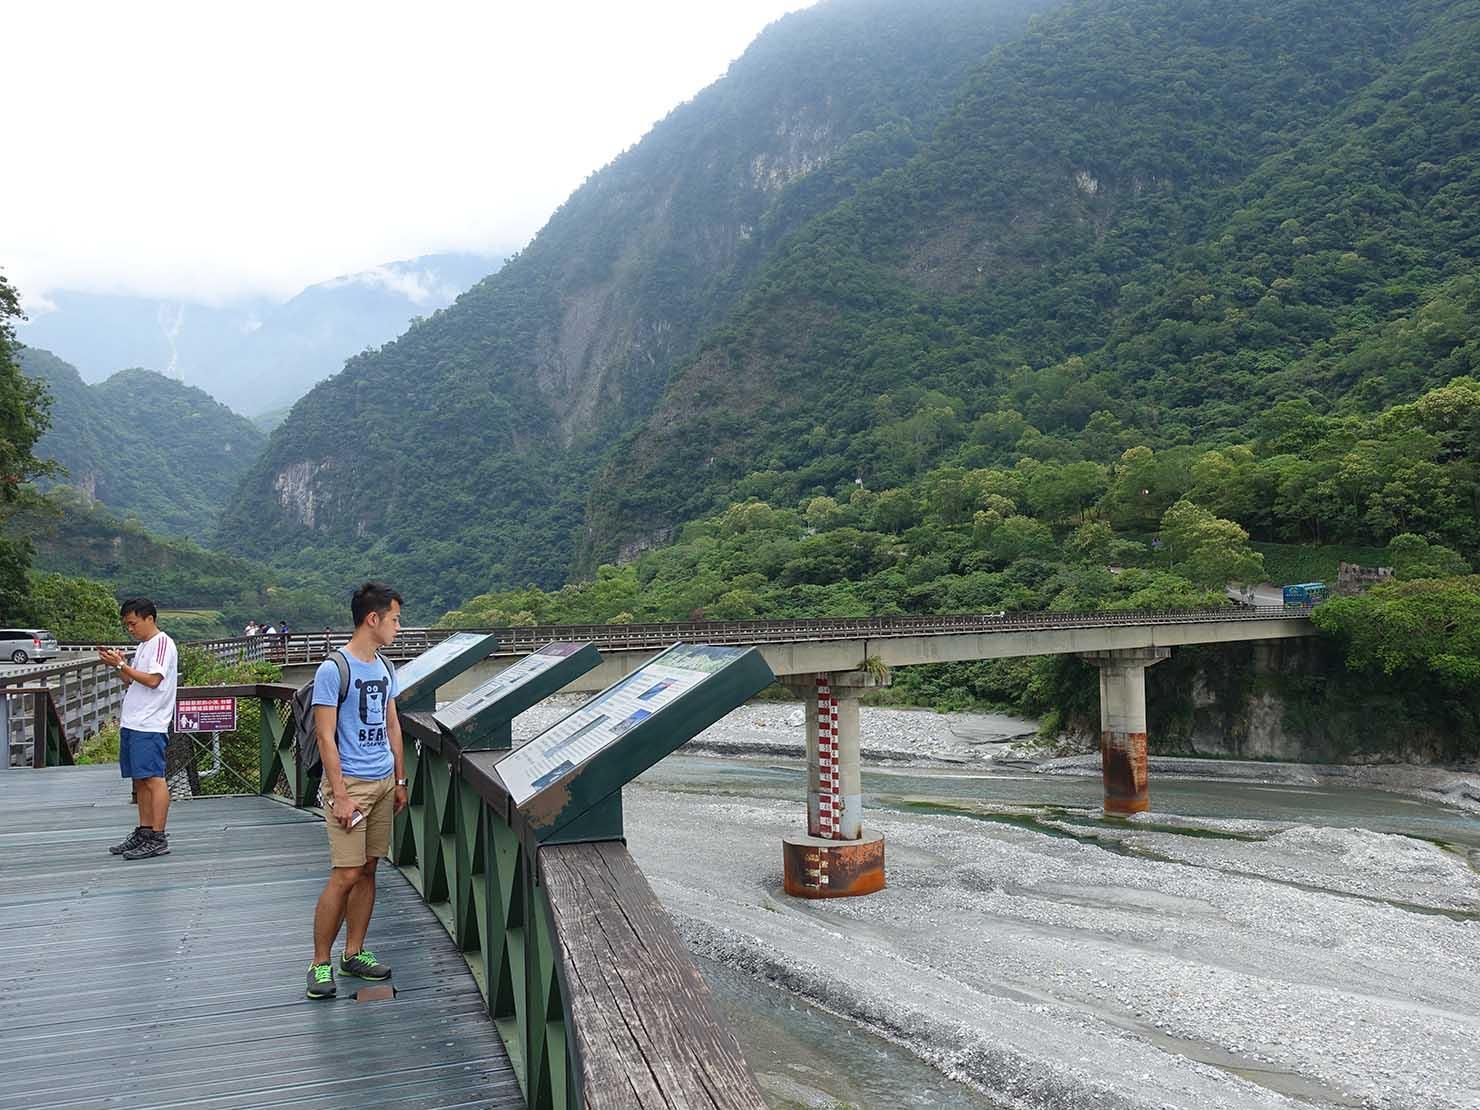 KKday外国人限定「花蓮・太魯閣(タロコ)日帰りツアー」太魯閣國家公園から望む山並